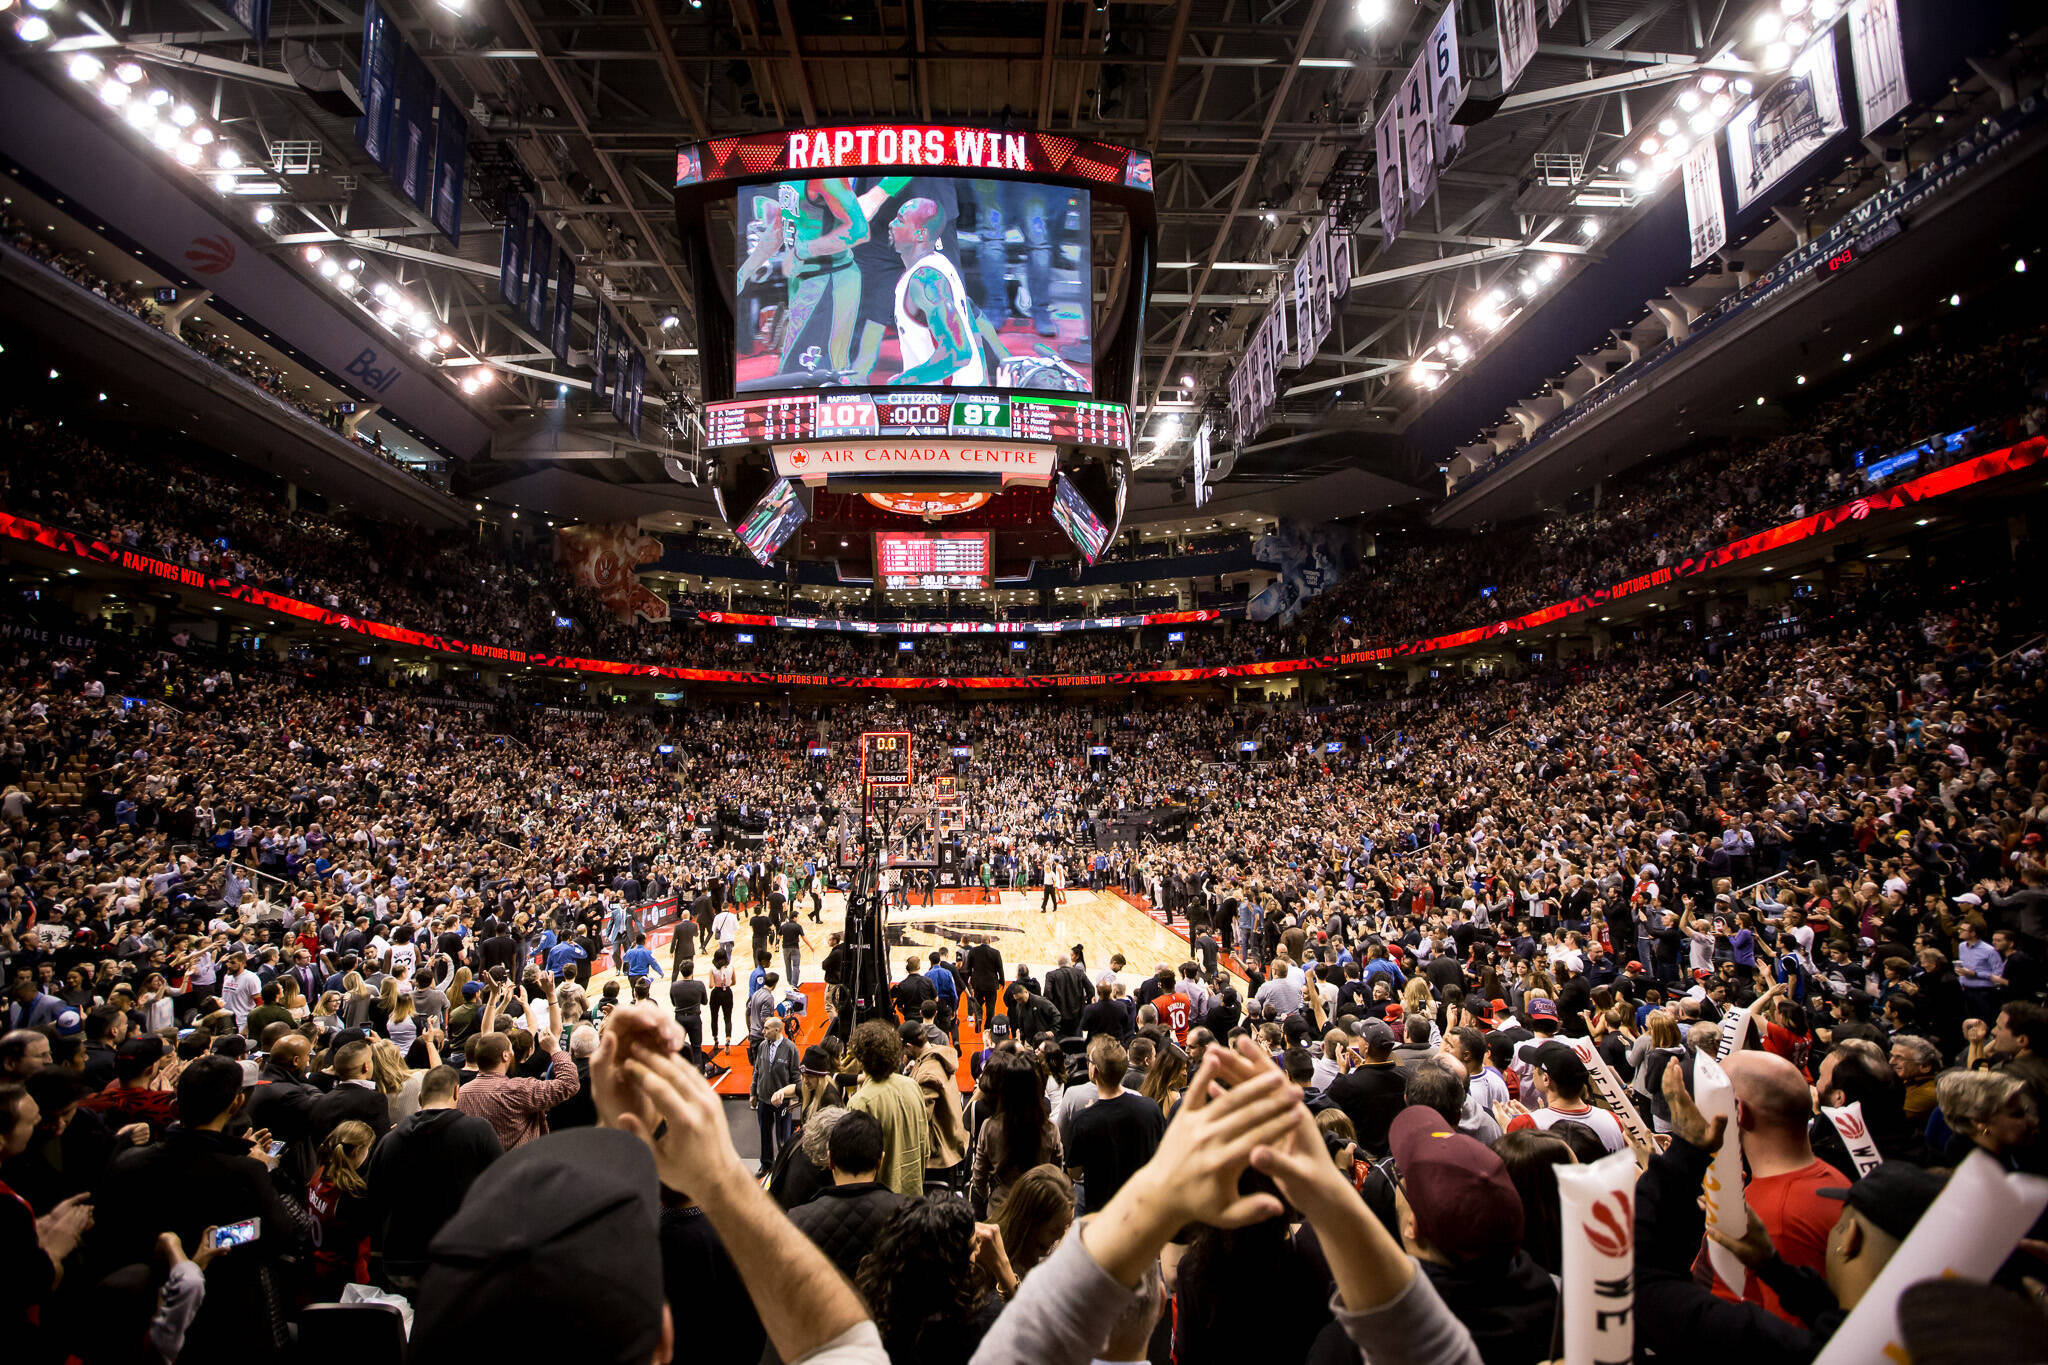 Toronto Raptors Home Arena